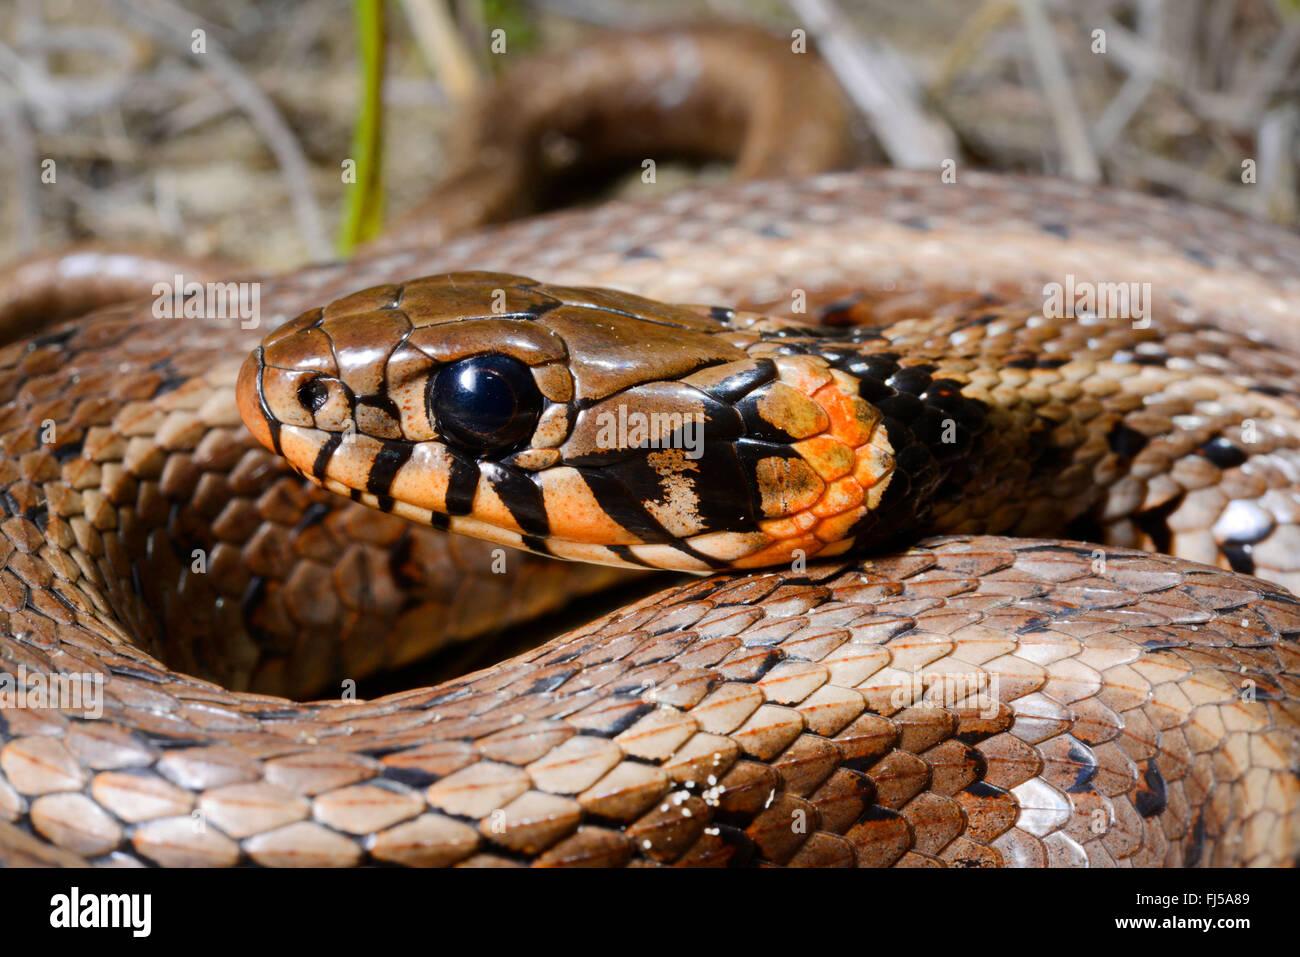 grass snake (Natrix natrix), portrait of a grass snake with orange spots at the collar, Romania, Dobrudscha, Biosphaerenreservat - Stock Image